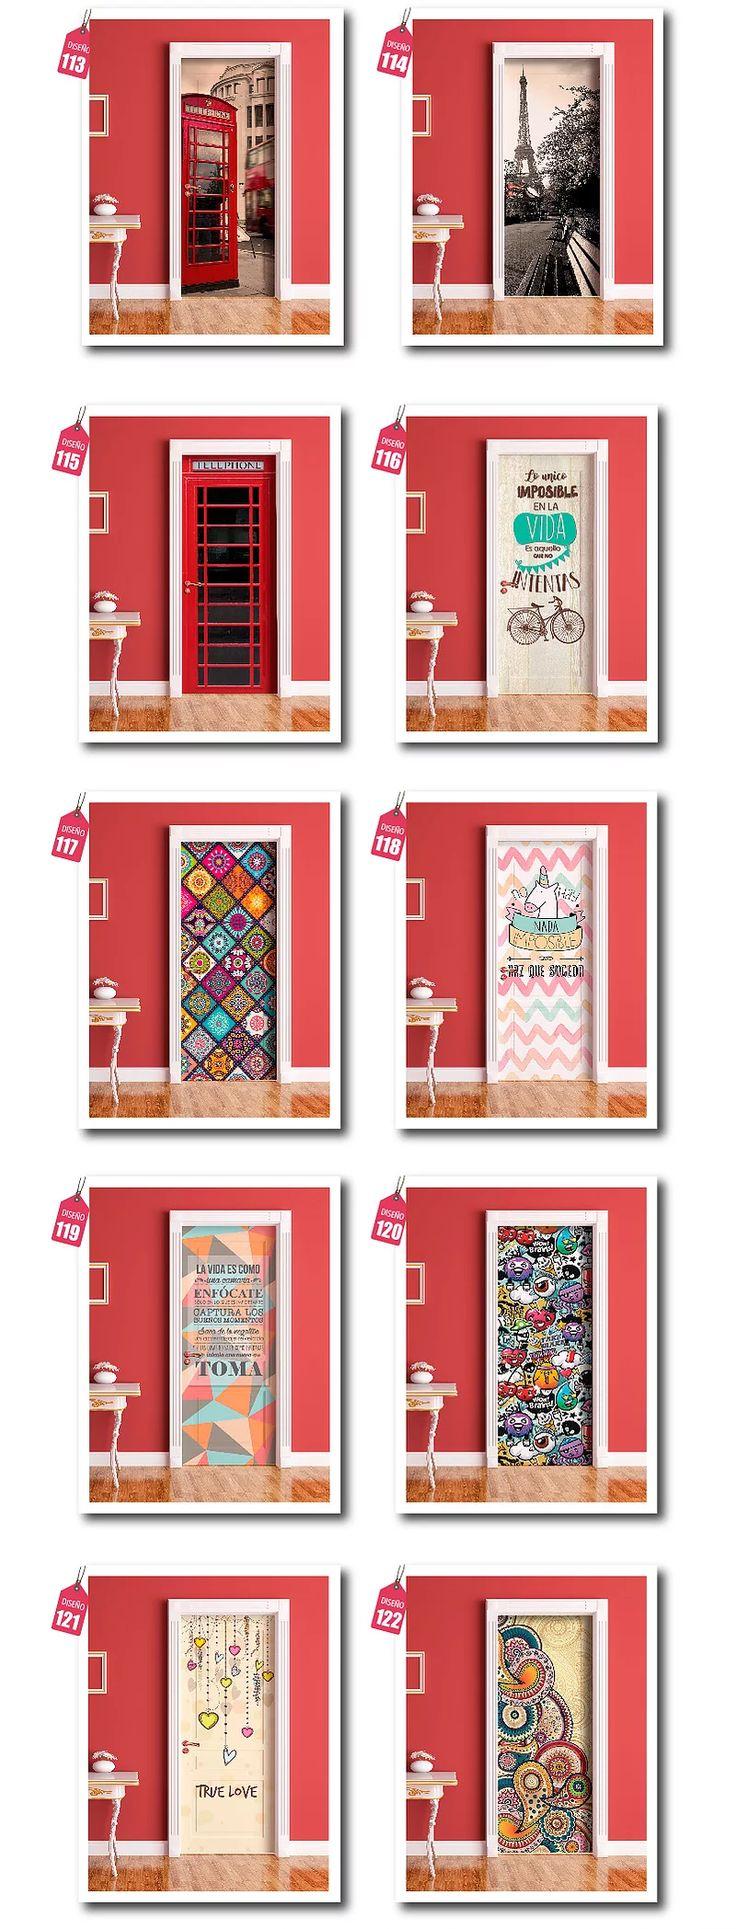 M s de 25 ideas incre bles sobre vinilos para puertas en for Vinilos pared personalizados